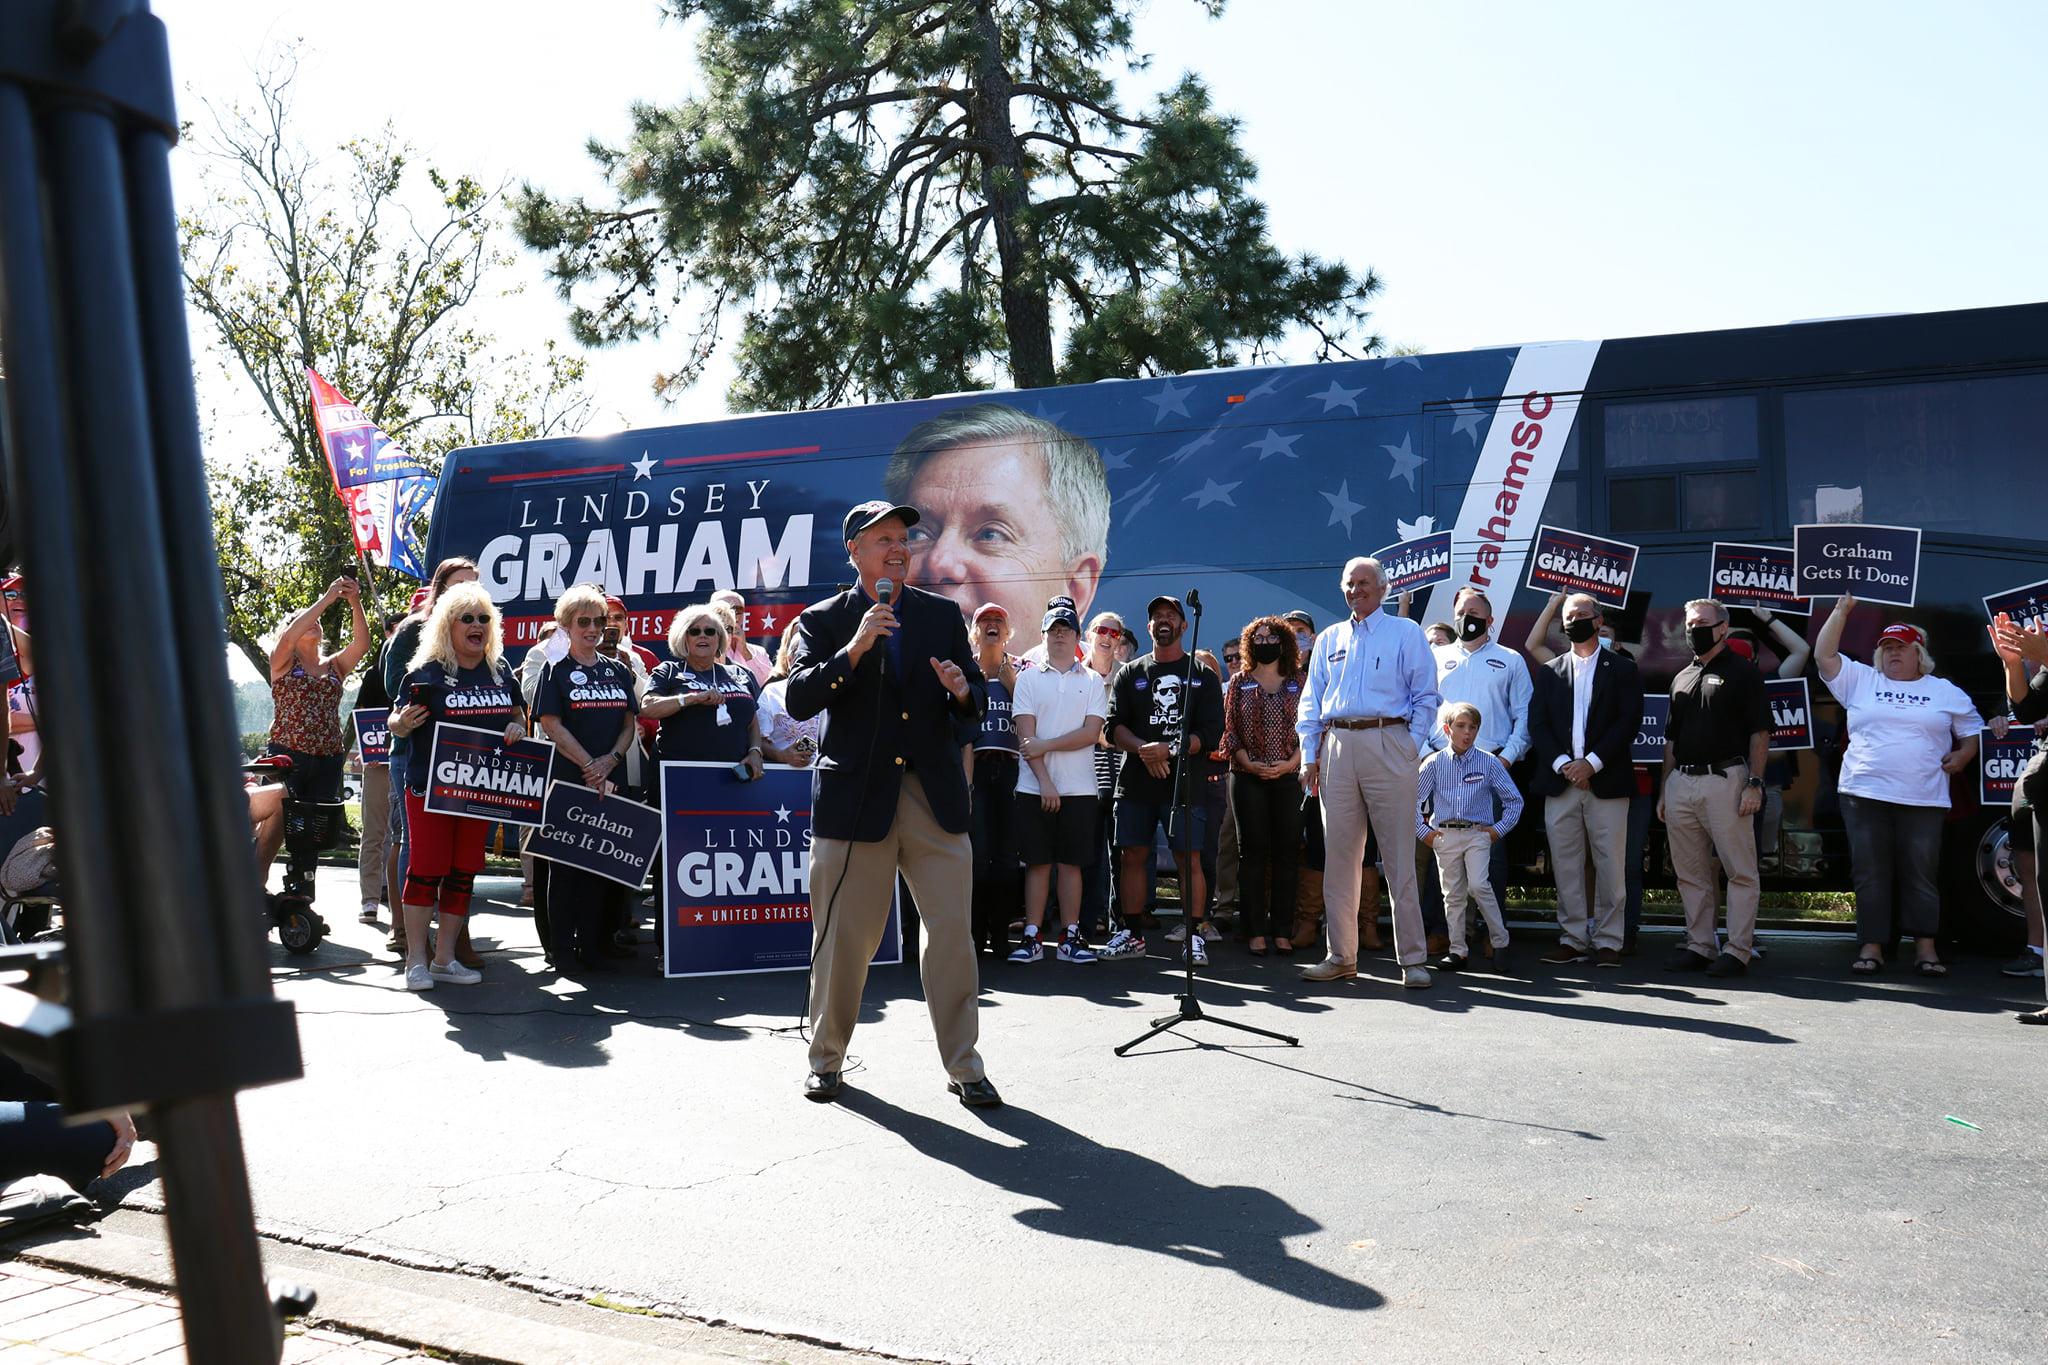 FITSNews – Lindsey Graham Faces Calls For Senate Investigation Over Voter Fraud Questioning